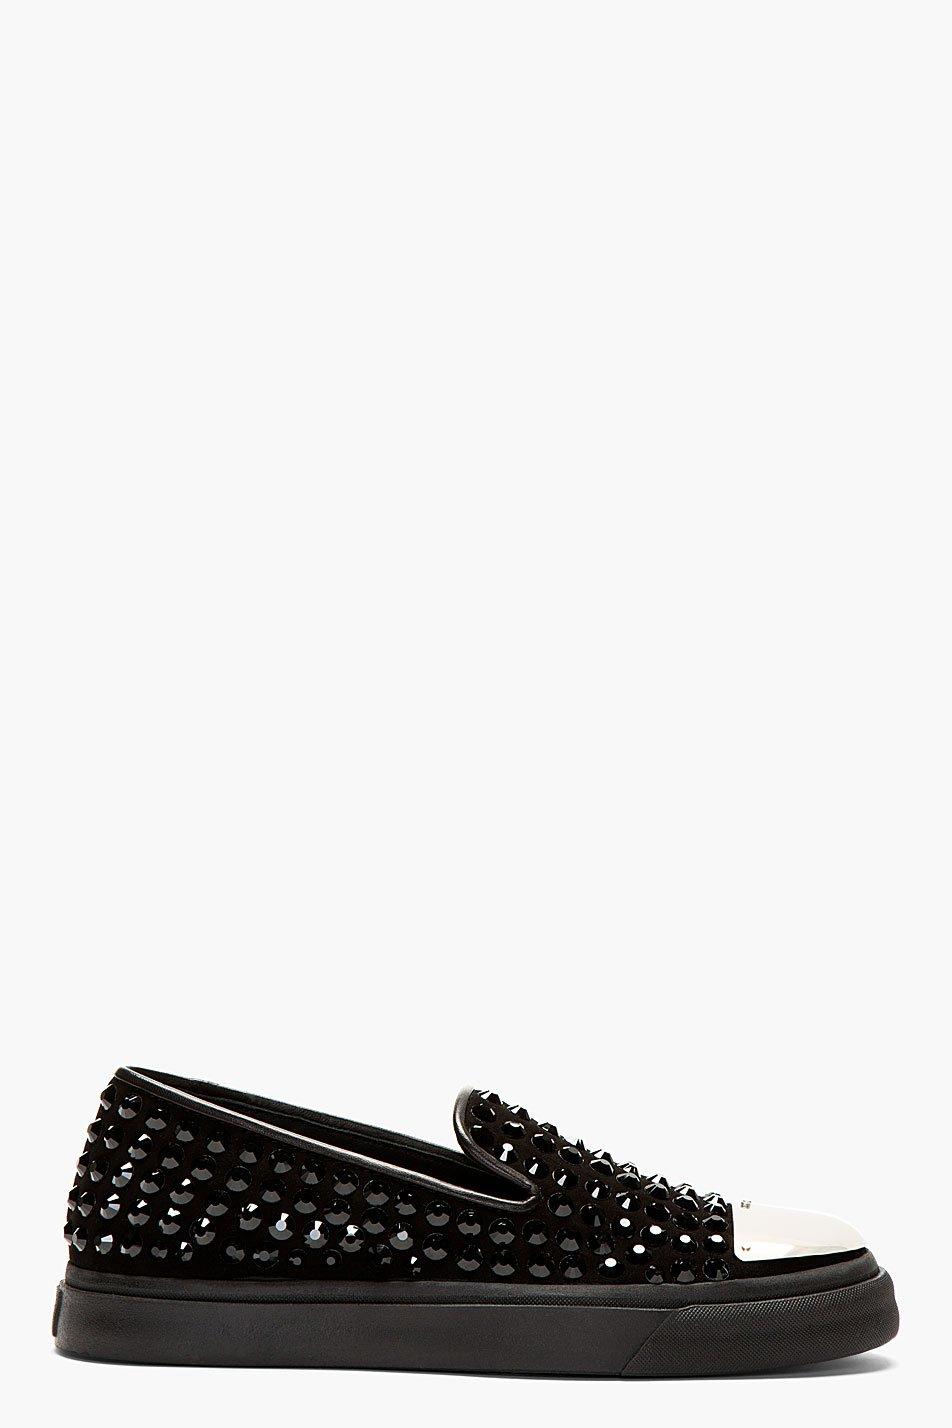 Giuseppe zanotti black crystal stud capped slip on sneakers